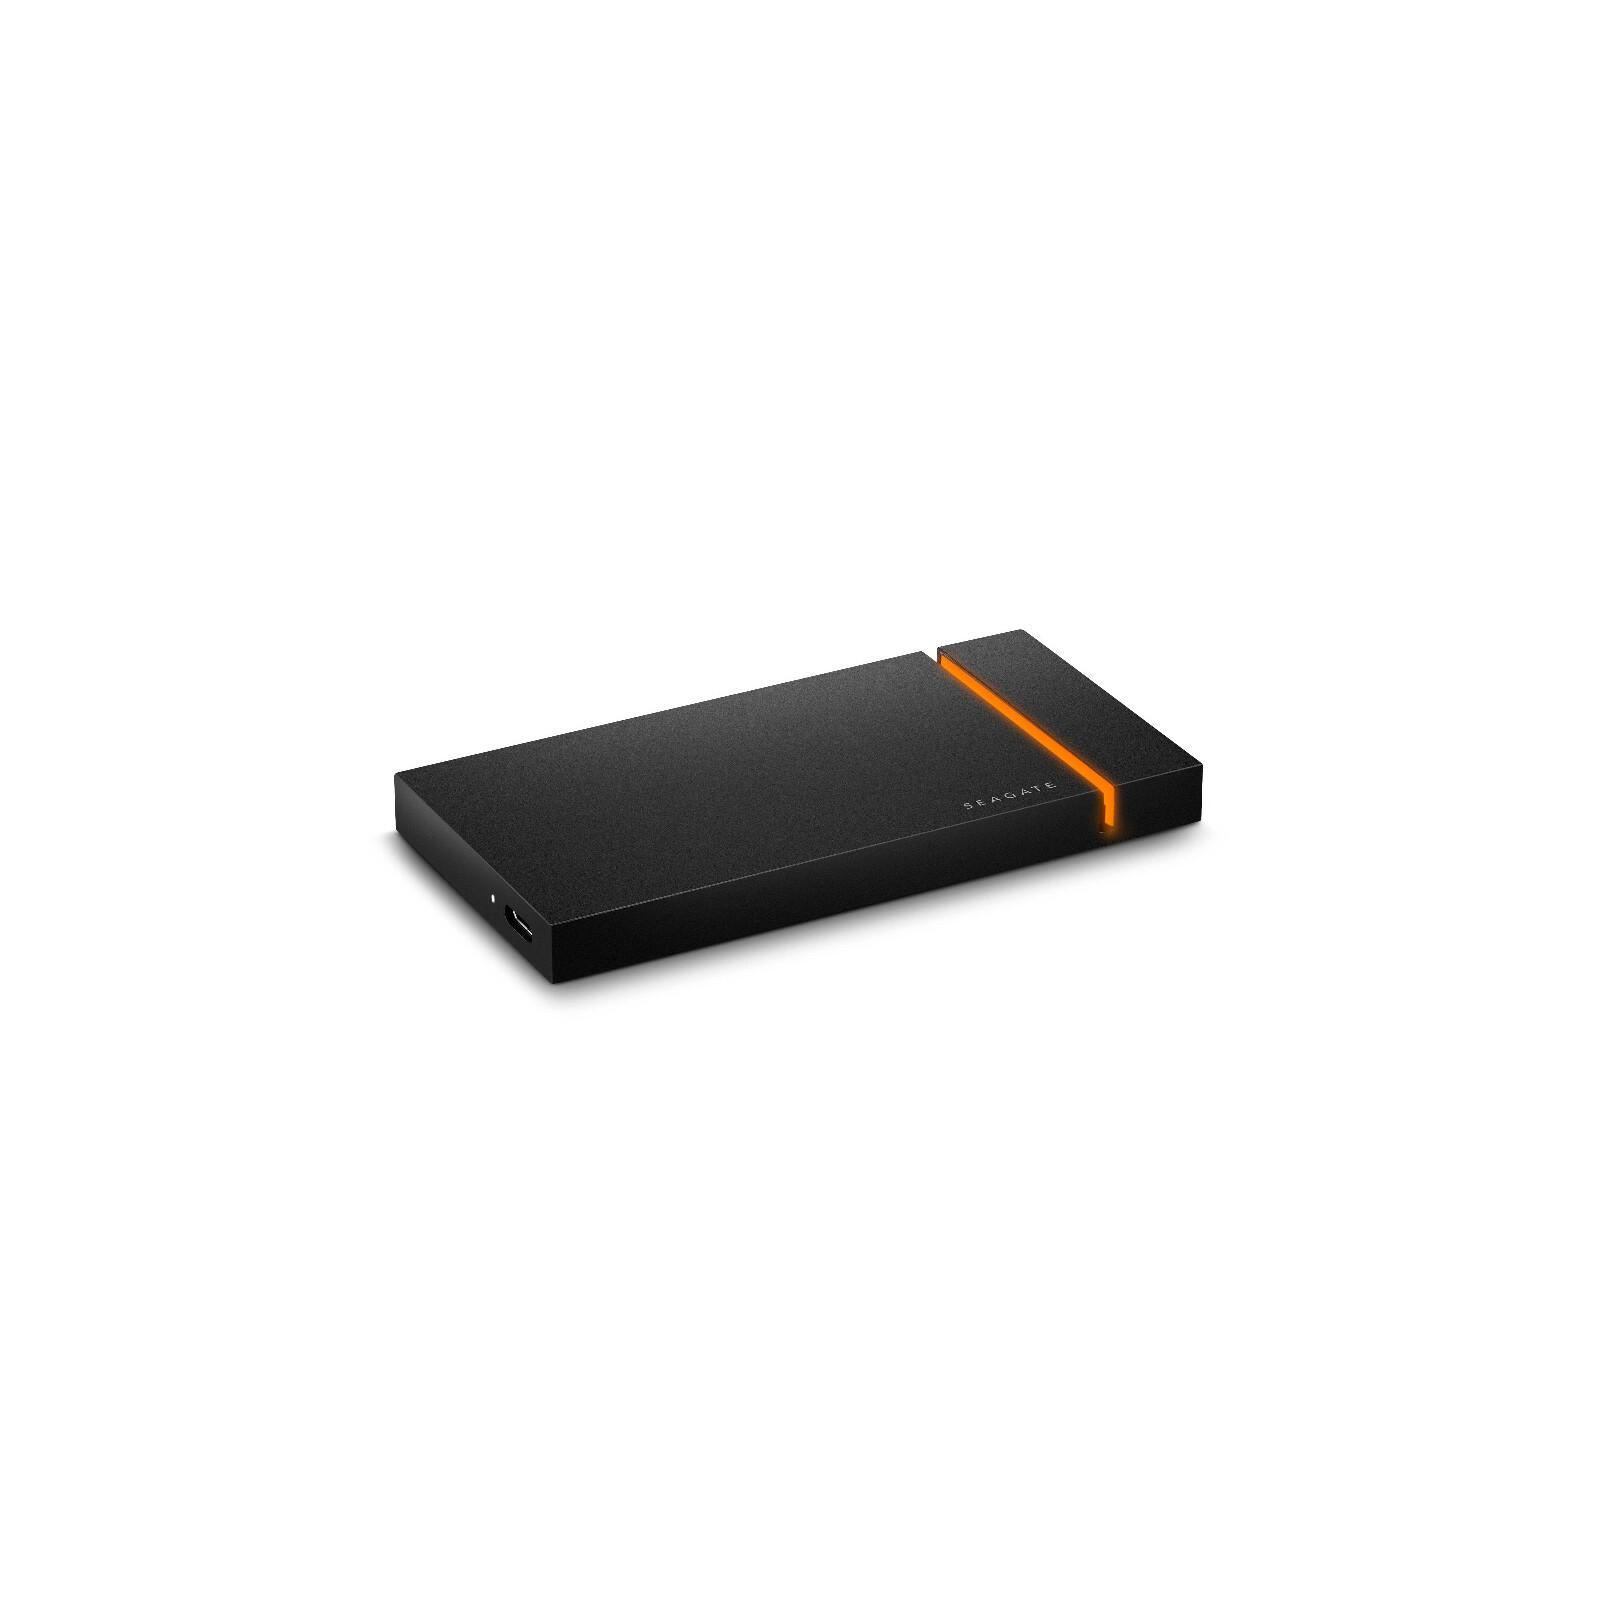 Seagate FireCuda Gaming SSD 500GB ext., NVMe, USB 3.2 gen2x2